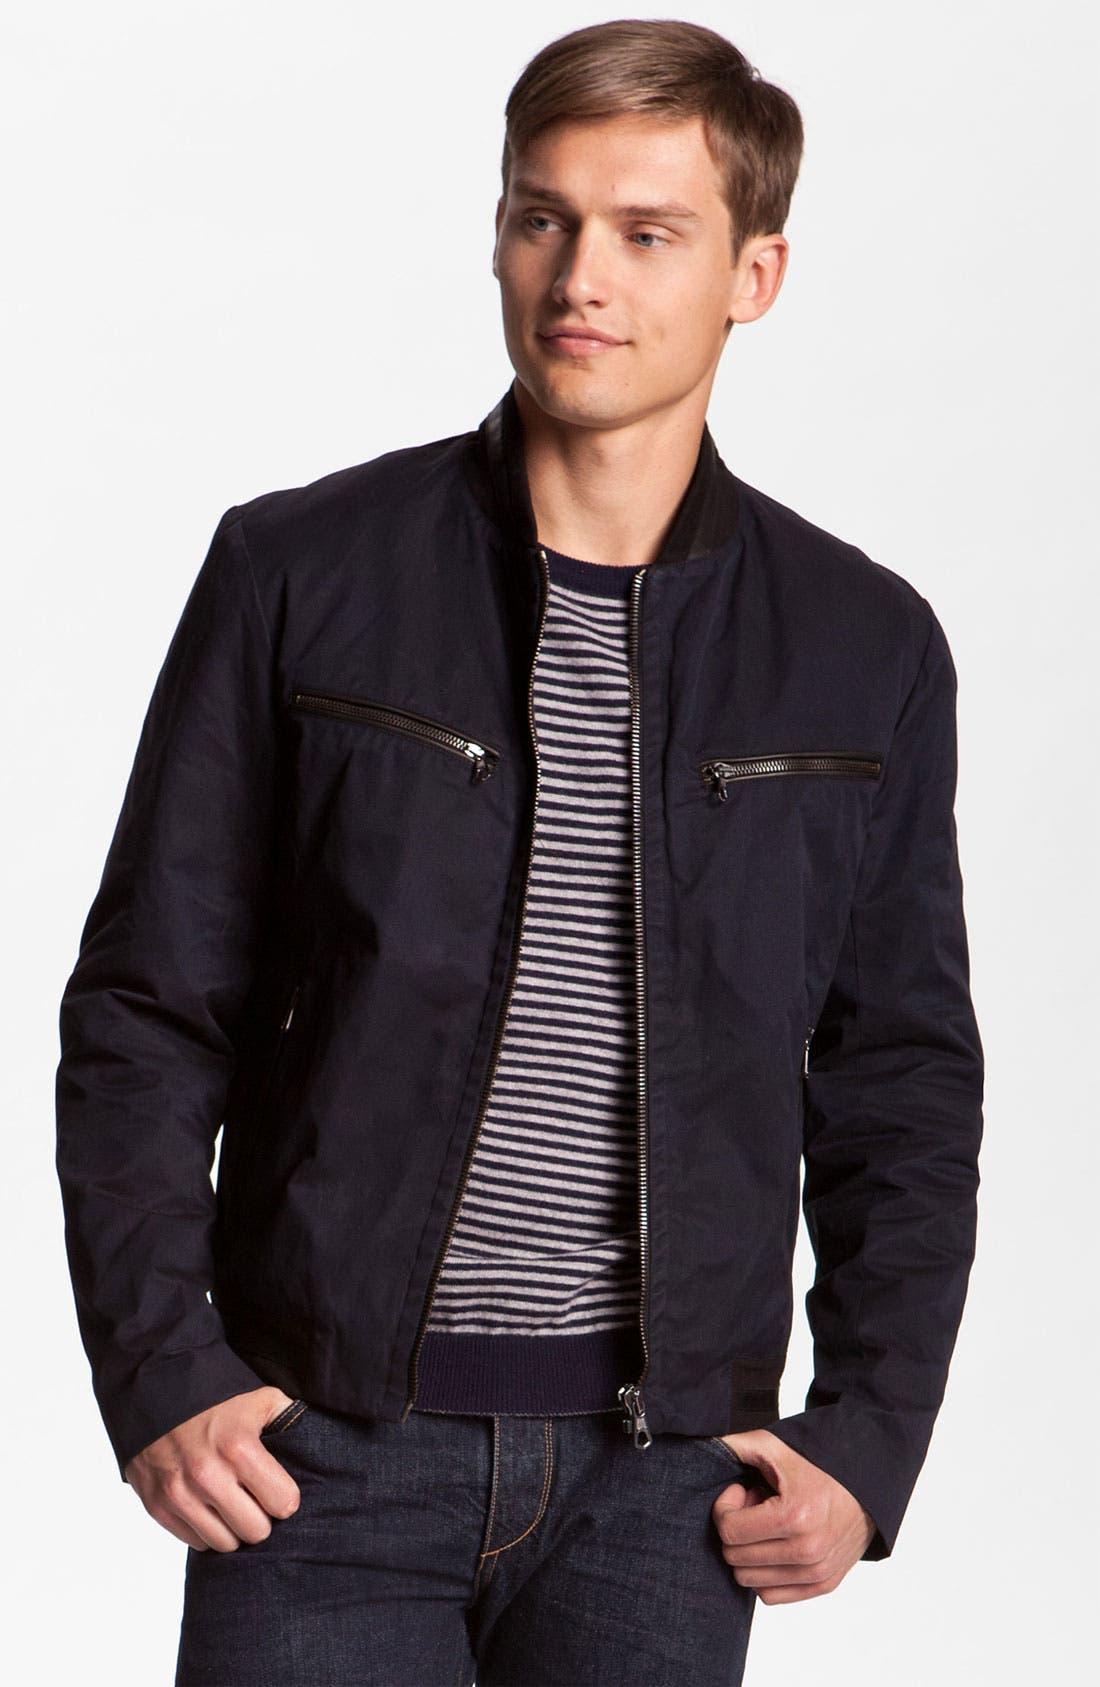 Alternate Image 1 Selected - rag & bone 'Mercer' Jacket